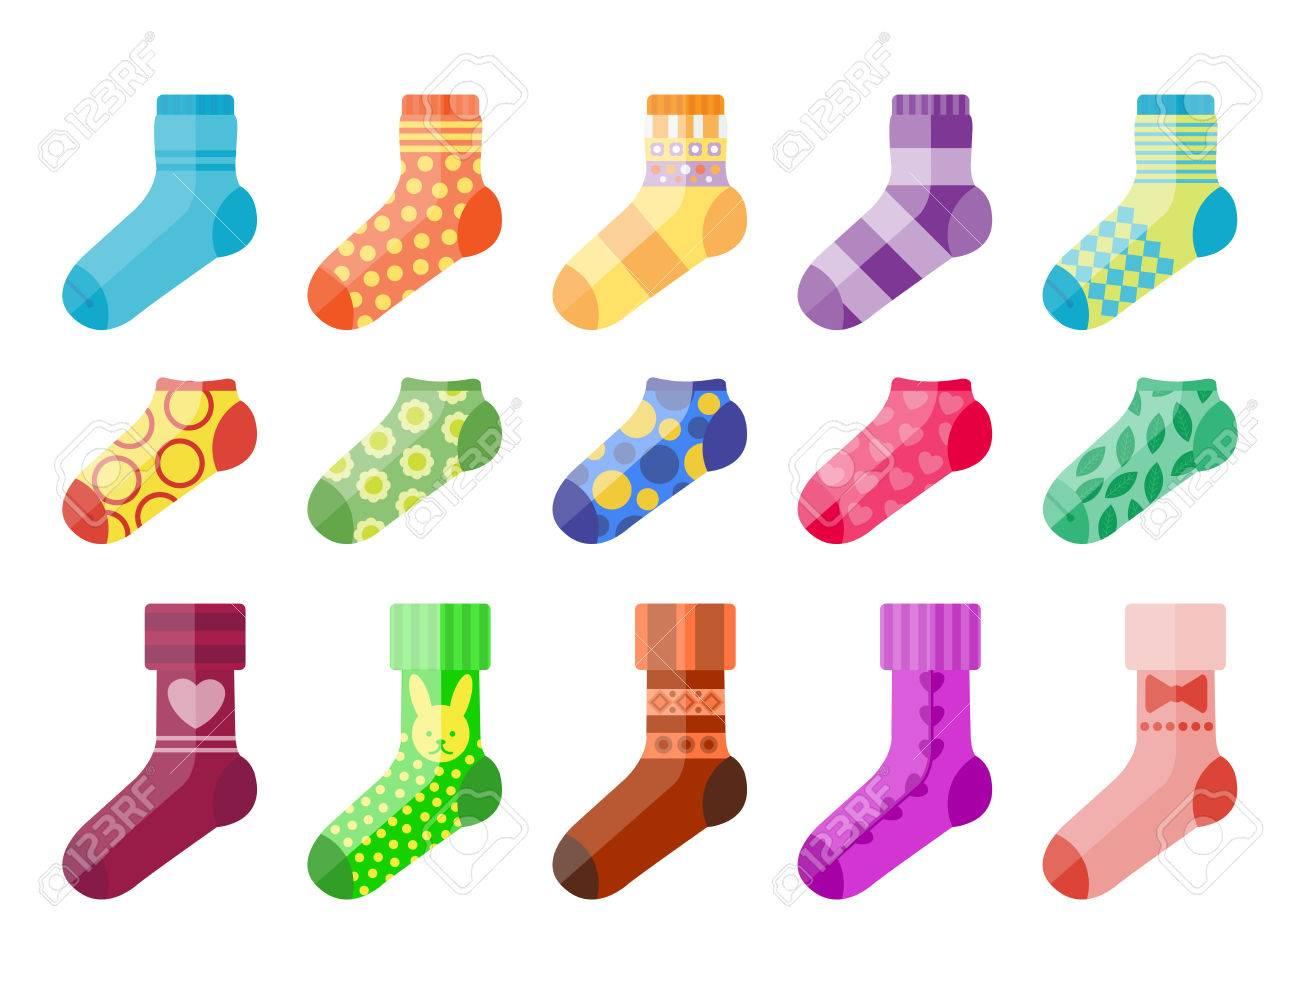 Flat design colorful socks set vector illustration selection of various cotton foot warm cloth - 80234660